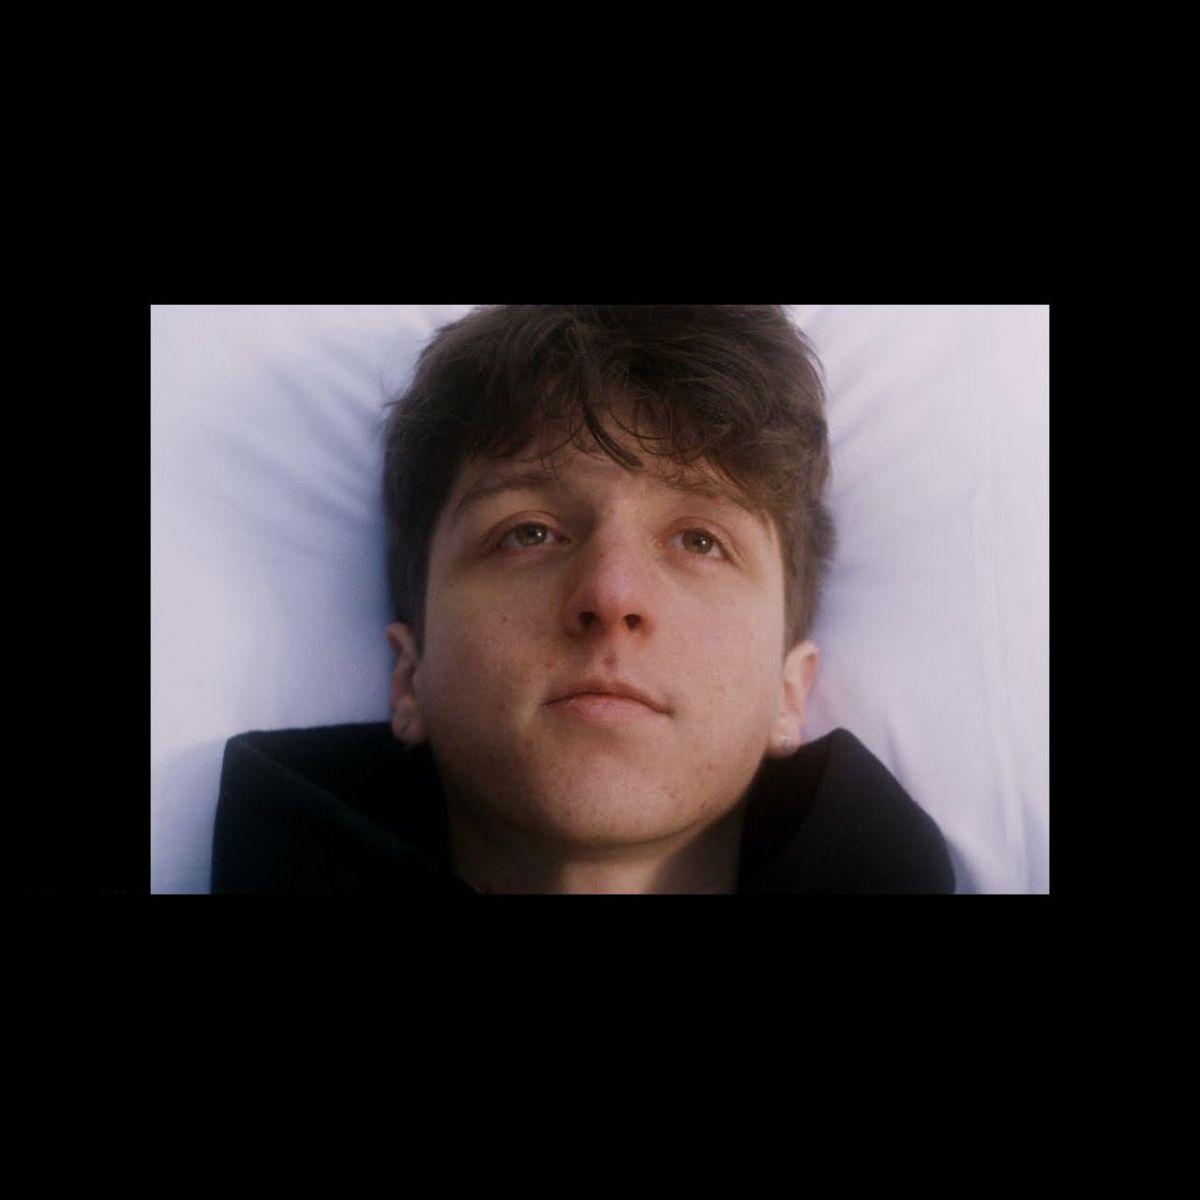 Powfu - Death Bed (Coffee For Your Head) (ft. Beabadoobee) (Thumbnail)